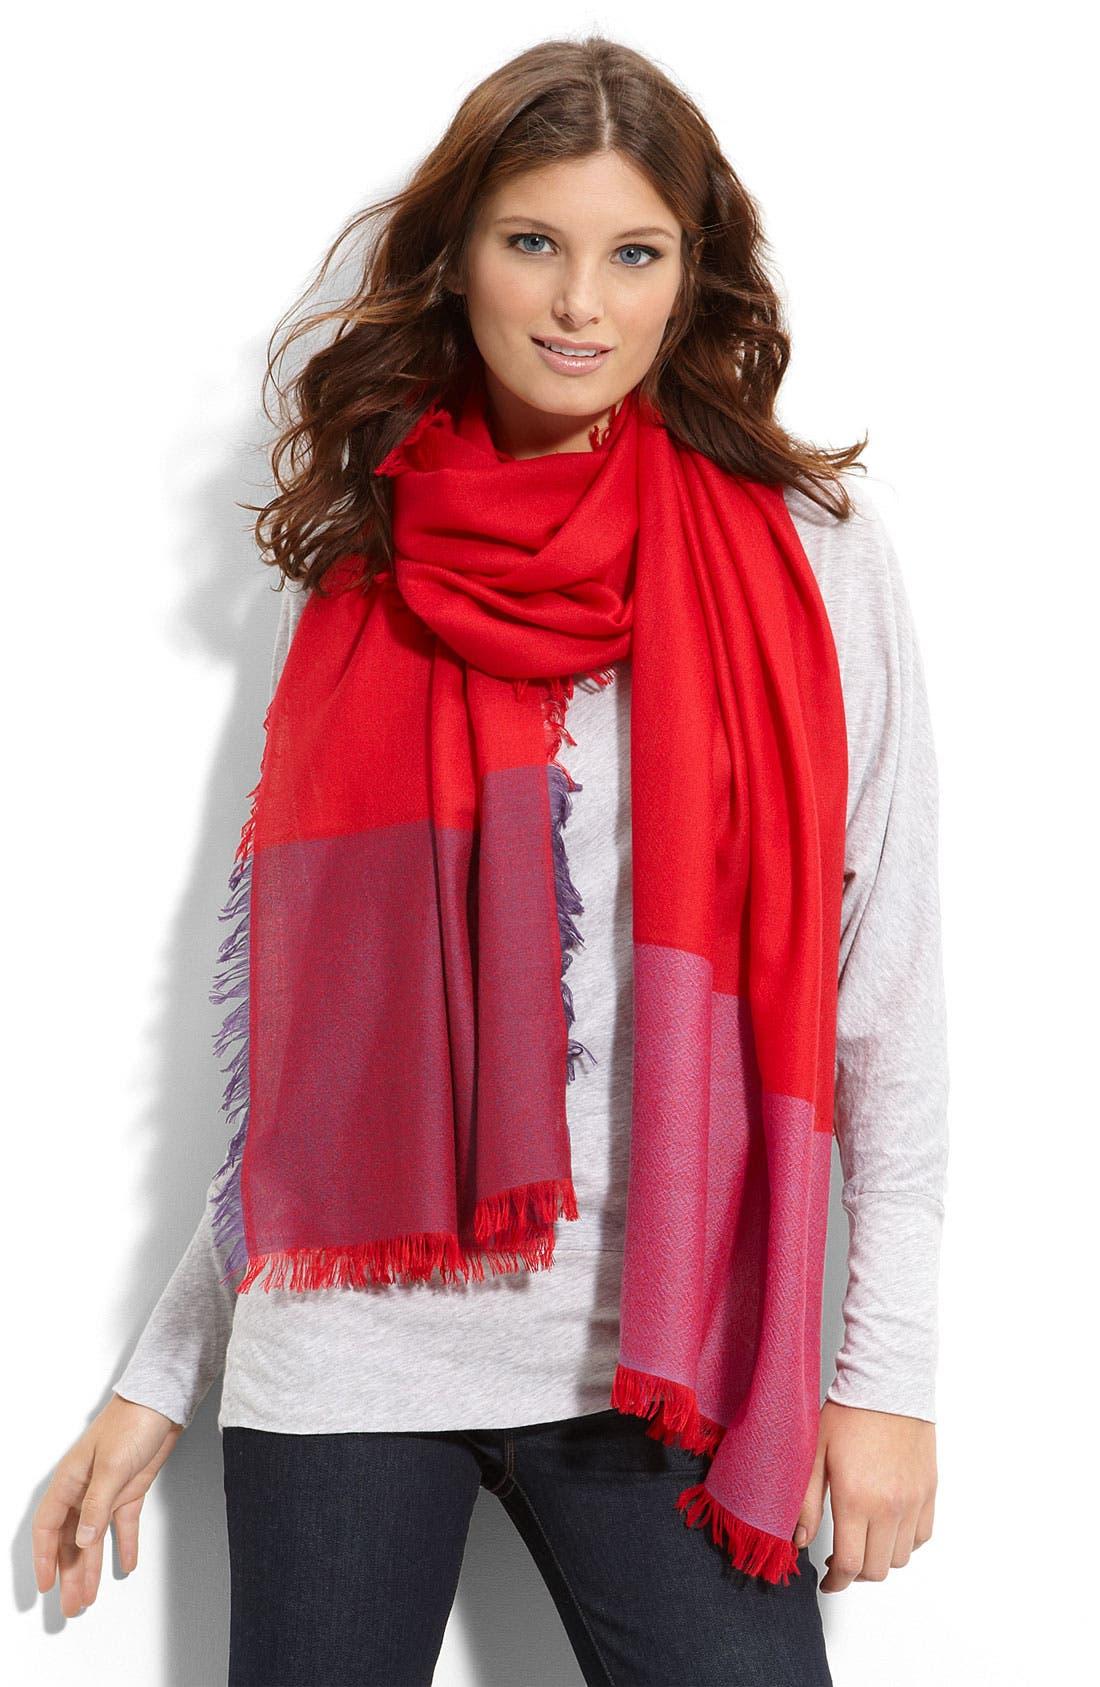 Main Image - Nordstrom 'Eyelash' Colorblock Cashmere Wrap